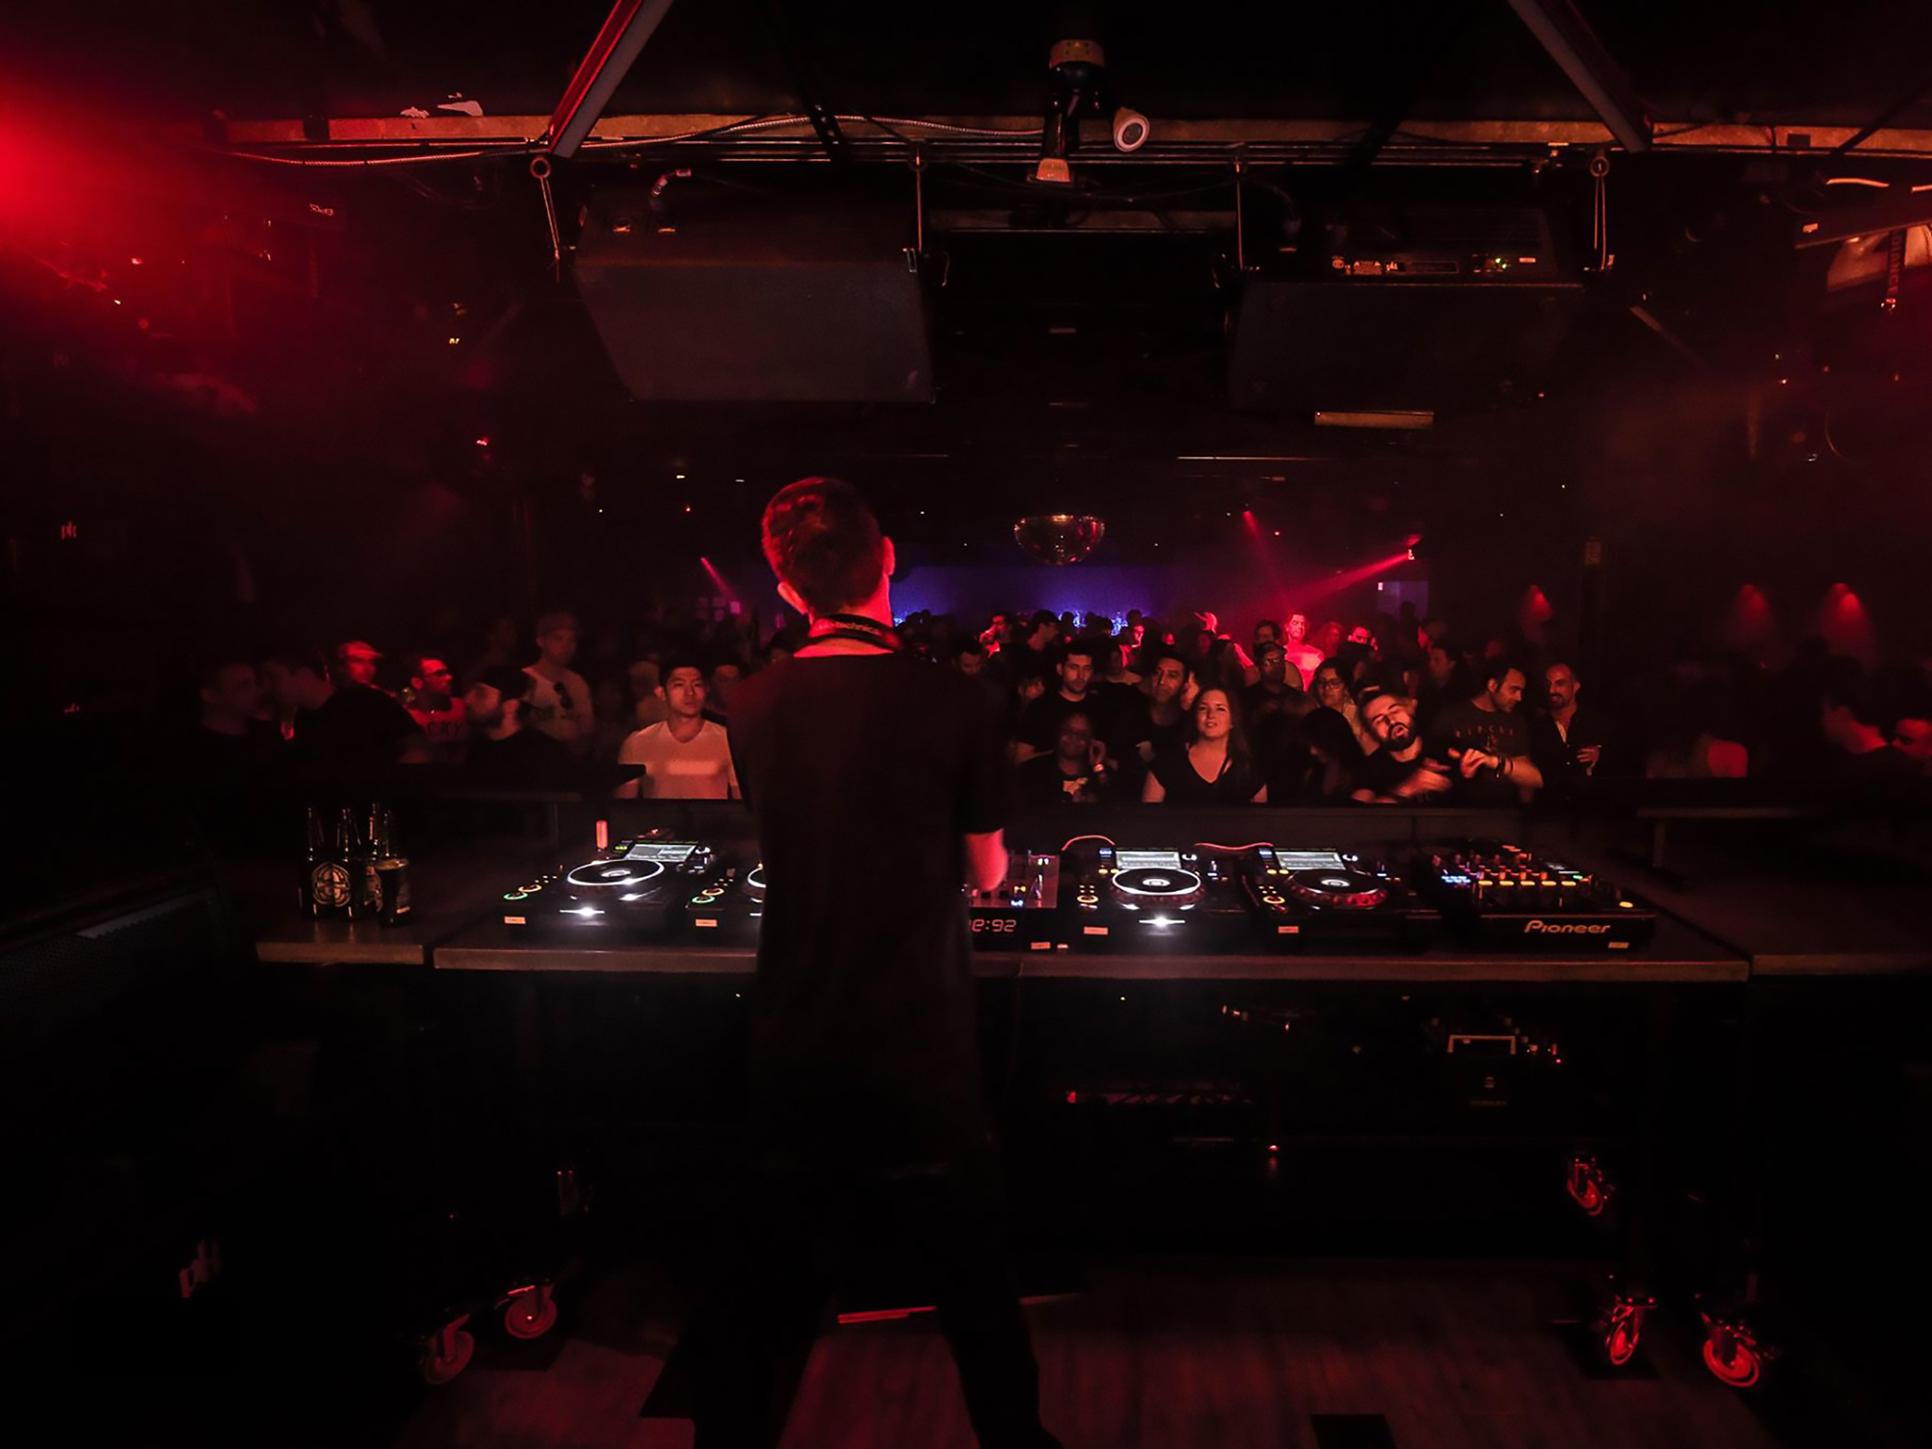 Terence Kissner DJ at Coda Toronto